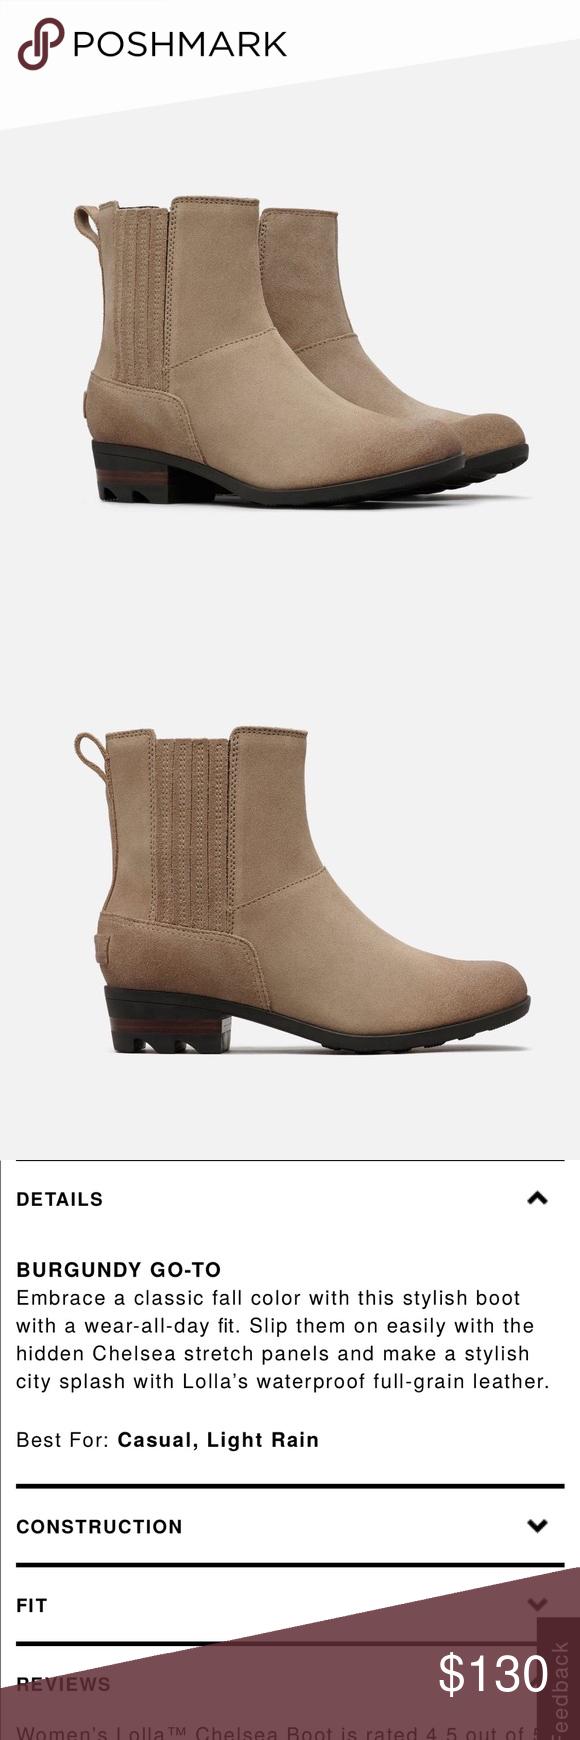 df13804ea23 NEW • Sorel • Lolla Chelsea Ankle Boots Ash Brown - Sorel - Women s - Lolla